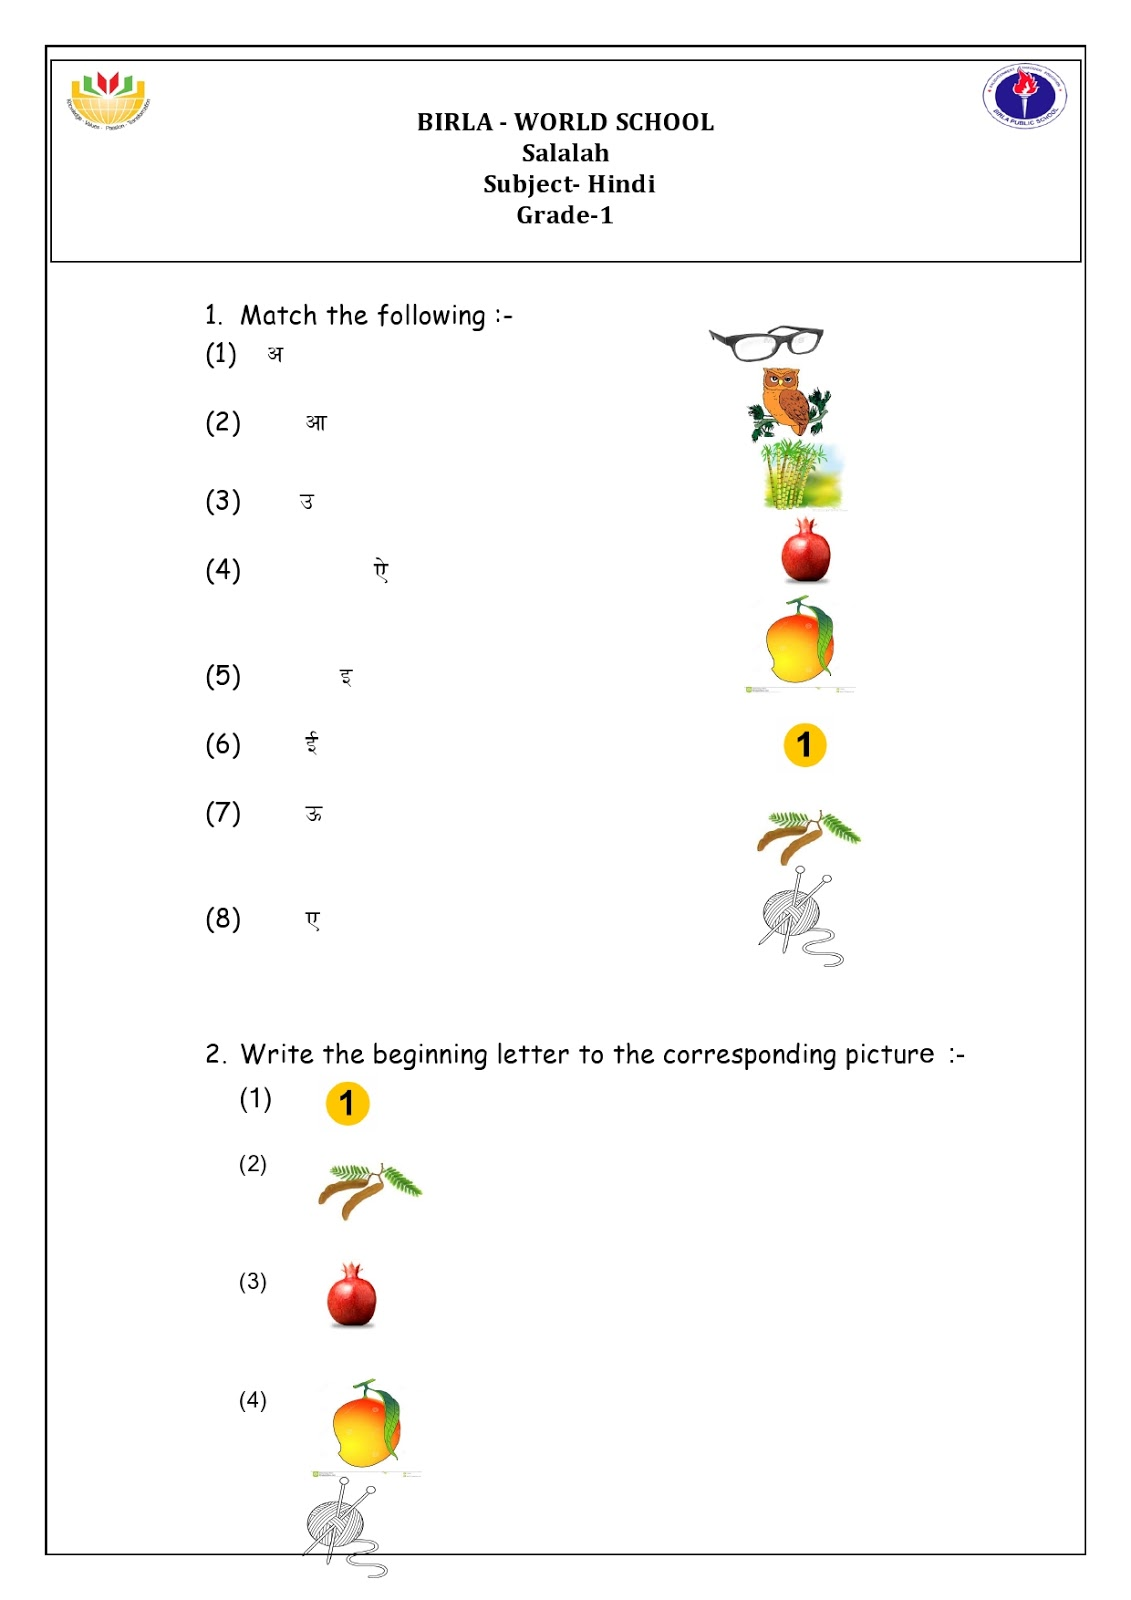 Birla World School Oman Homework For Grade 1 B And D On 18 08 16